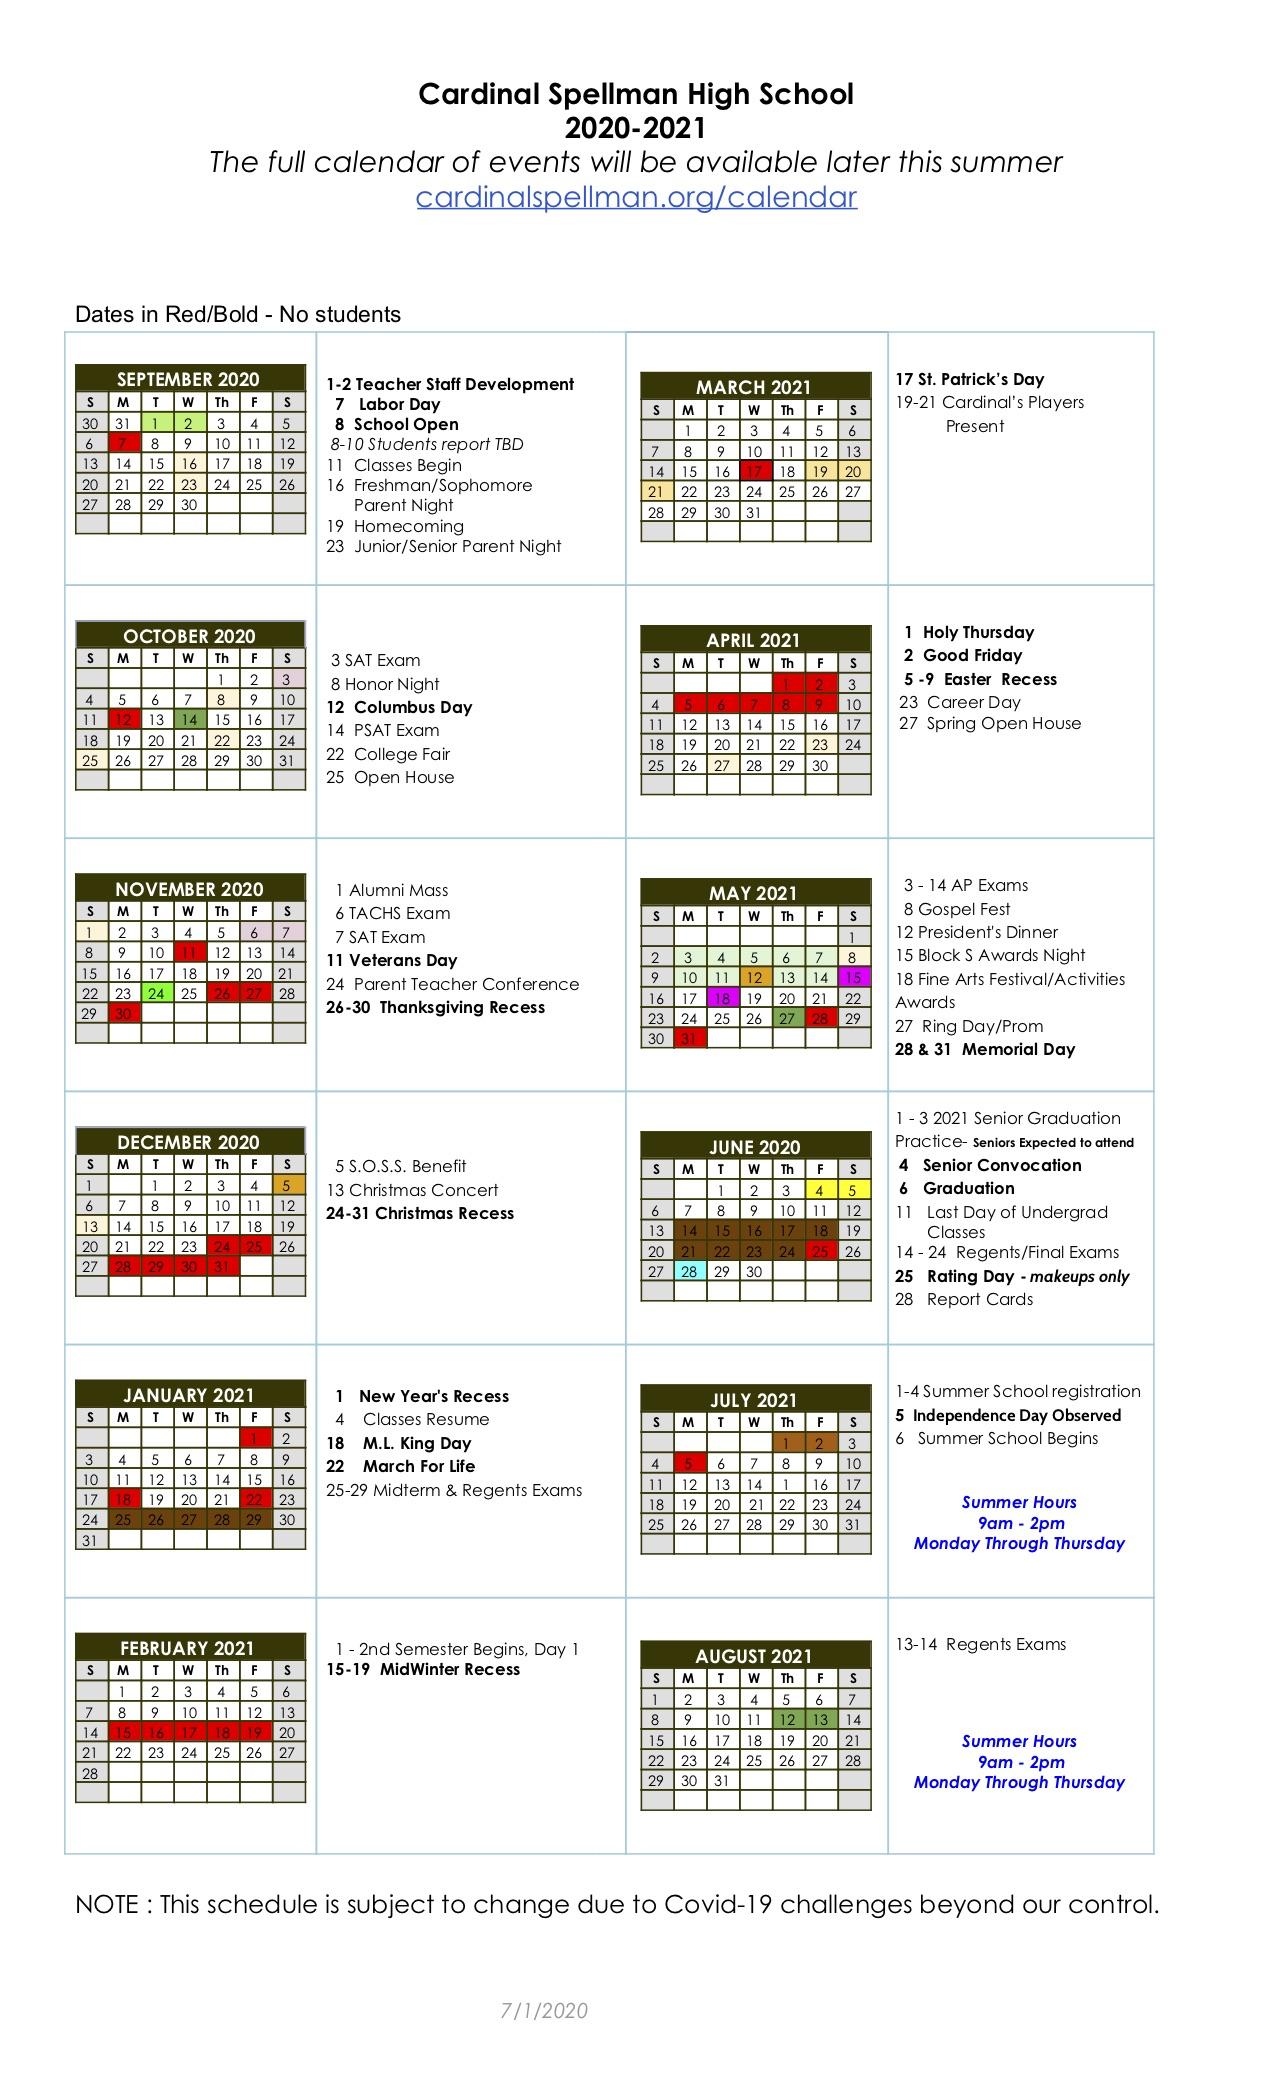 Rider University Academic Calendar 2021 2020 2021 Academic Calendar   News and Announcements